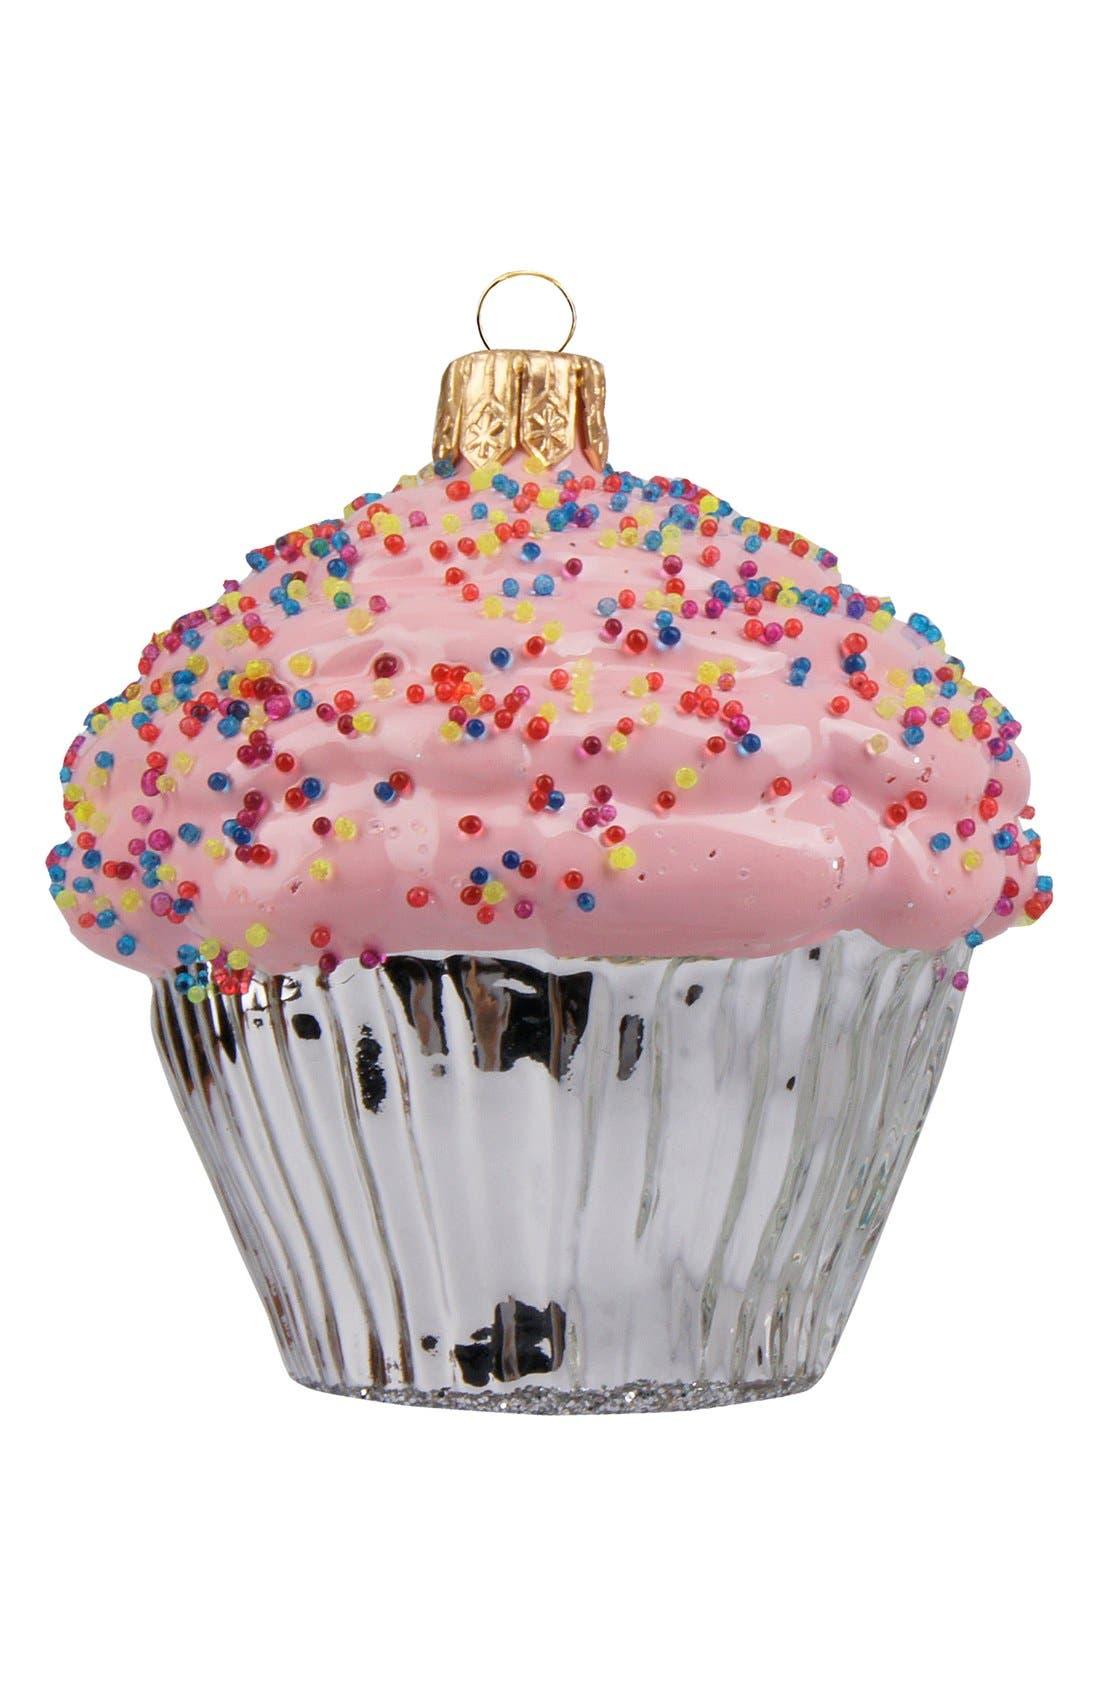 Alternate Image 1 Selected - Nordstrom at Home Handblown Cupcake Ornament